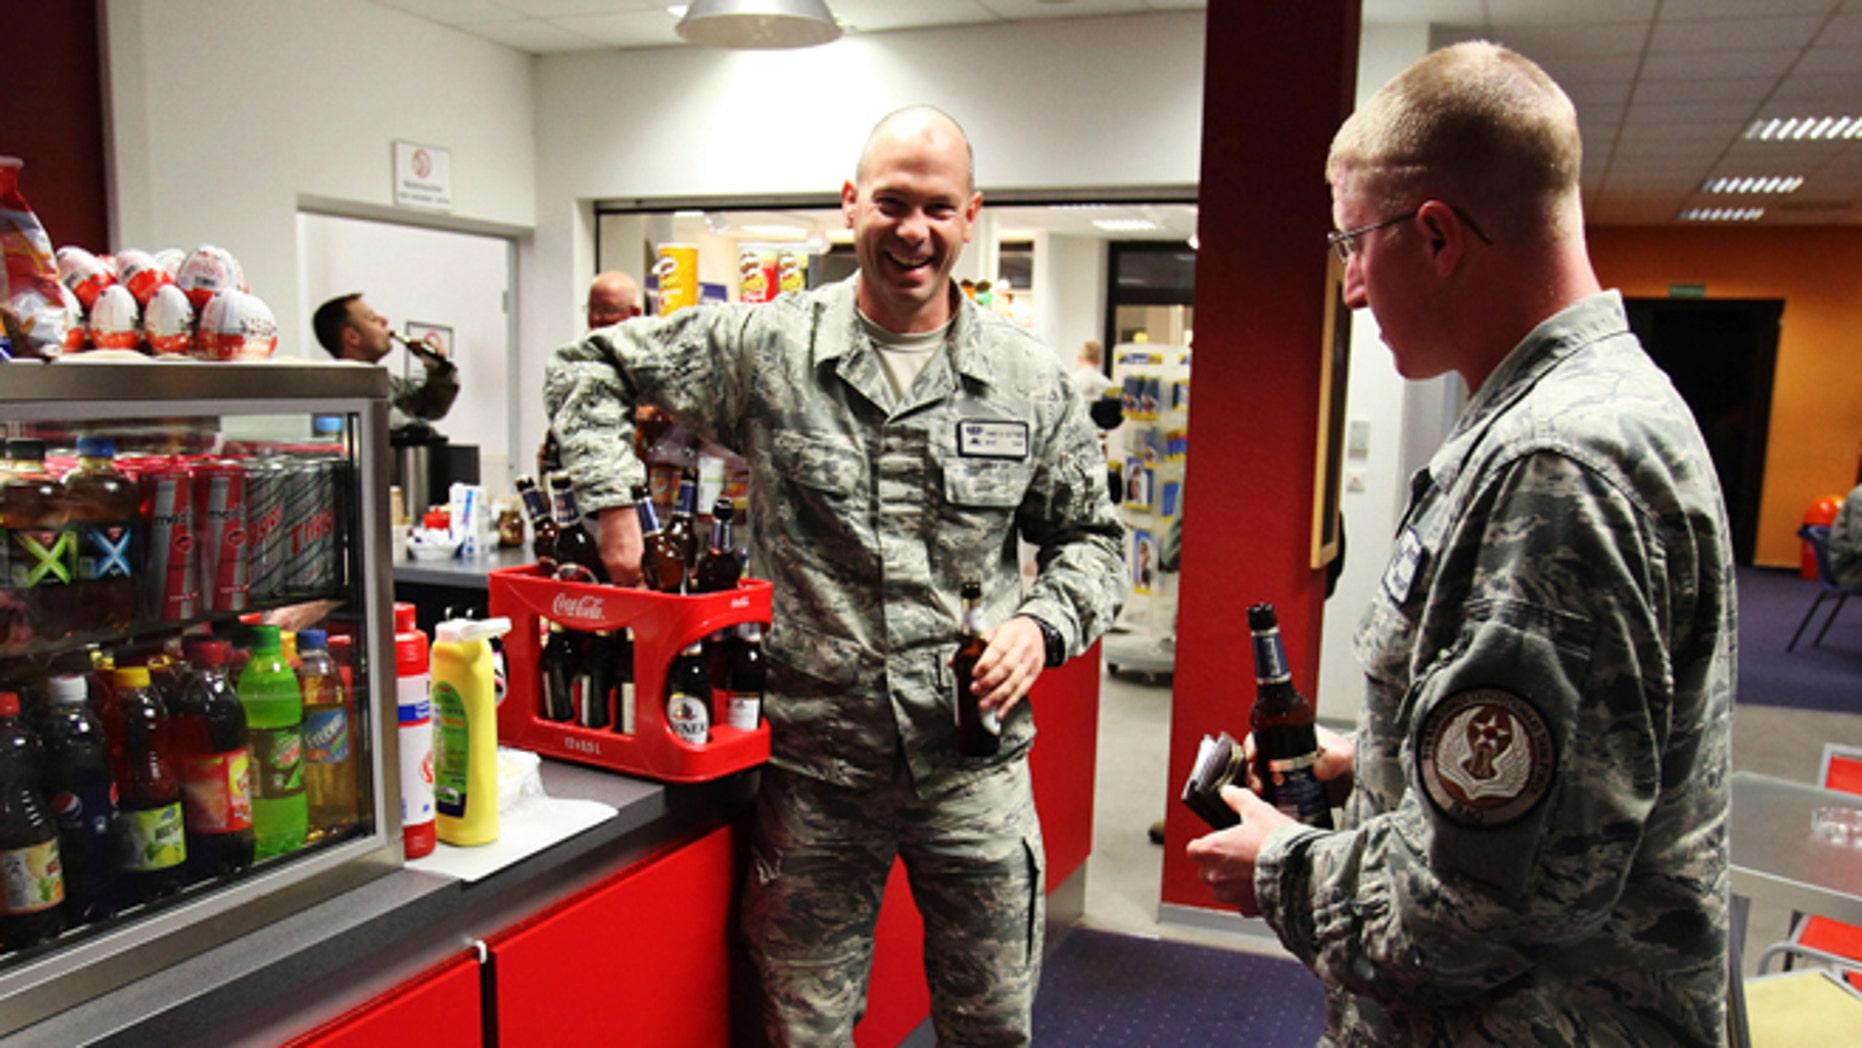 FILE: 2011: U.S. Air Force airman carries beers that he purchased, in Frankfurt, Germany.